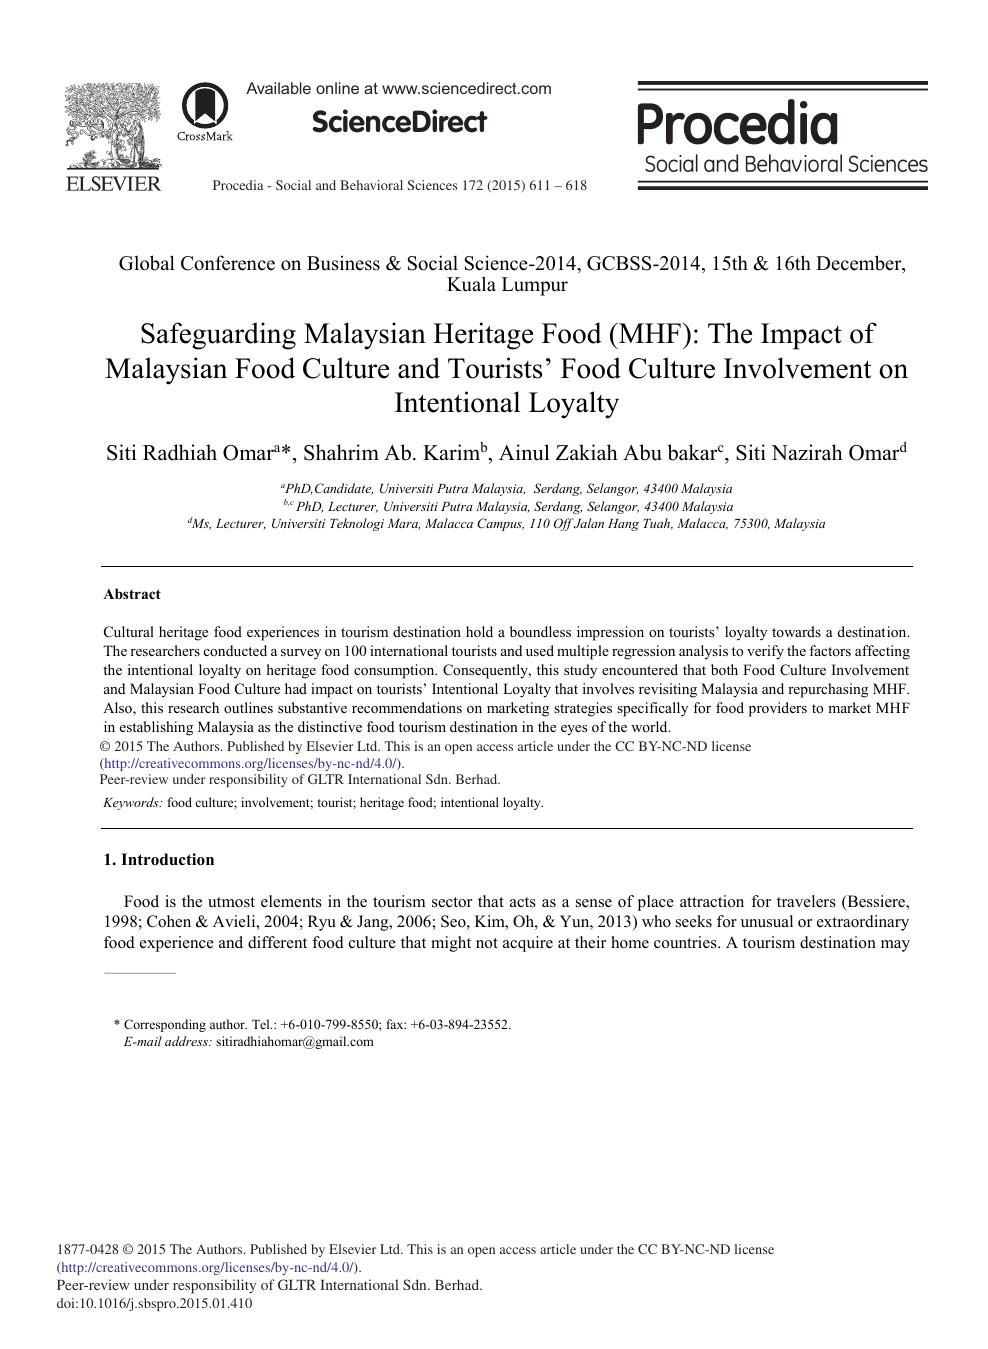 Safeguarding Malaysian Heritage Food (MHF): The Impact of Malaysian